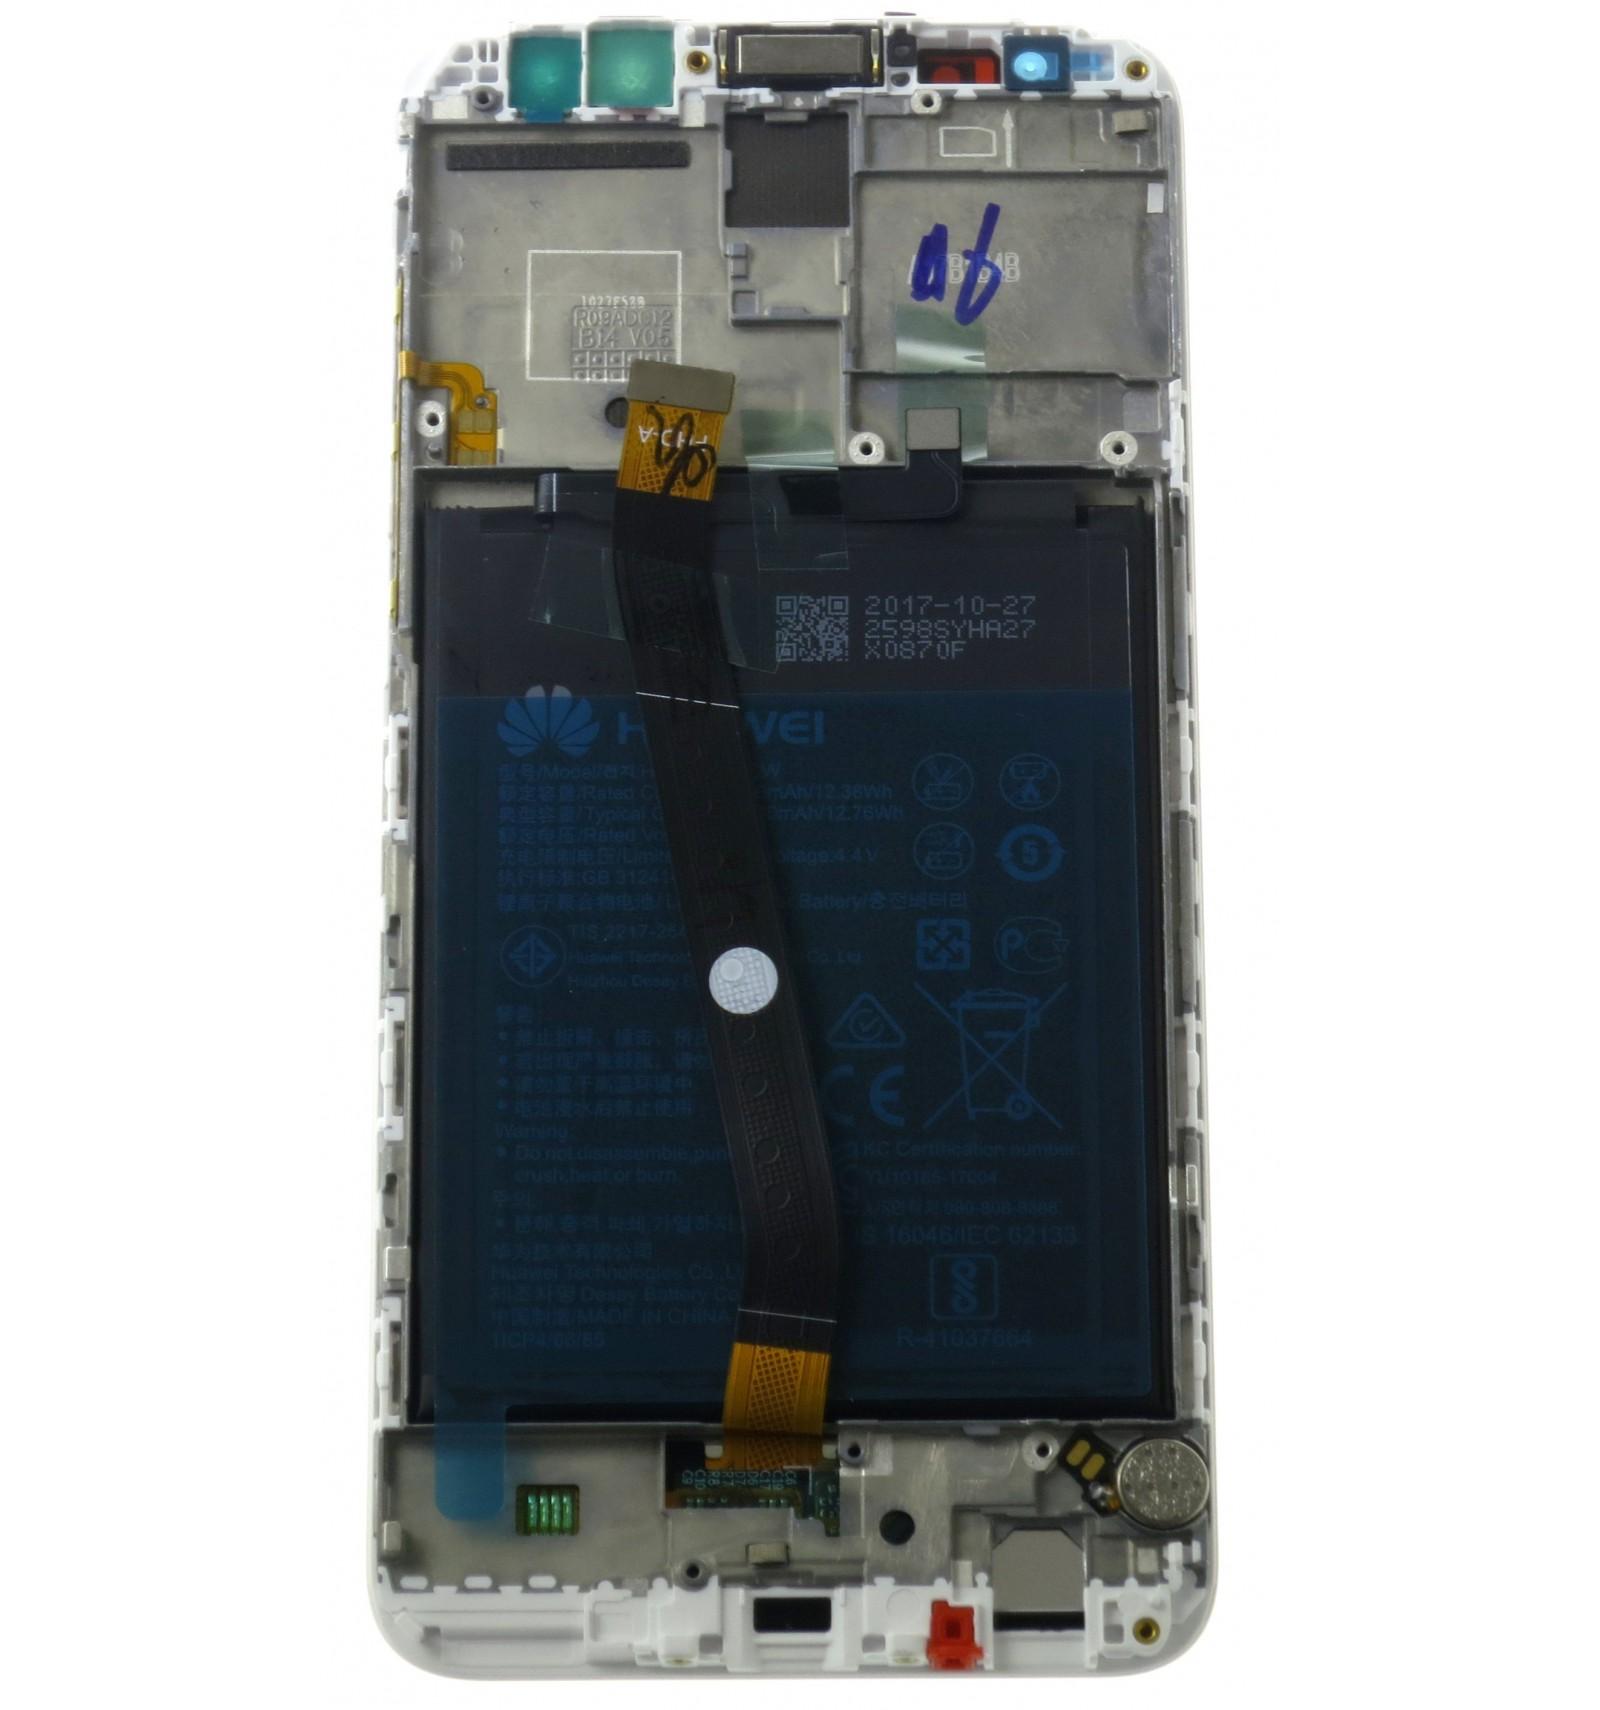 Lcd Touch Screen Frame Small Parts White Original For Huawei Touchscreen Plus Xiaomi Redmi 3 3s 3x 3pro Mate 10 Lite